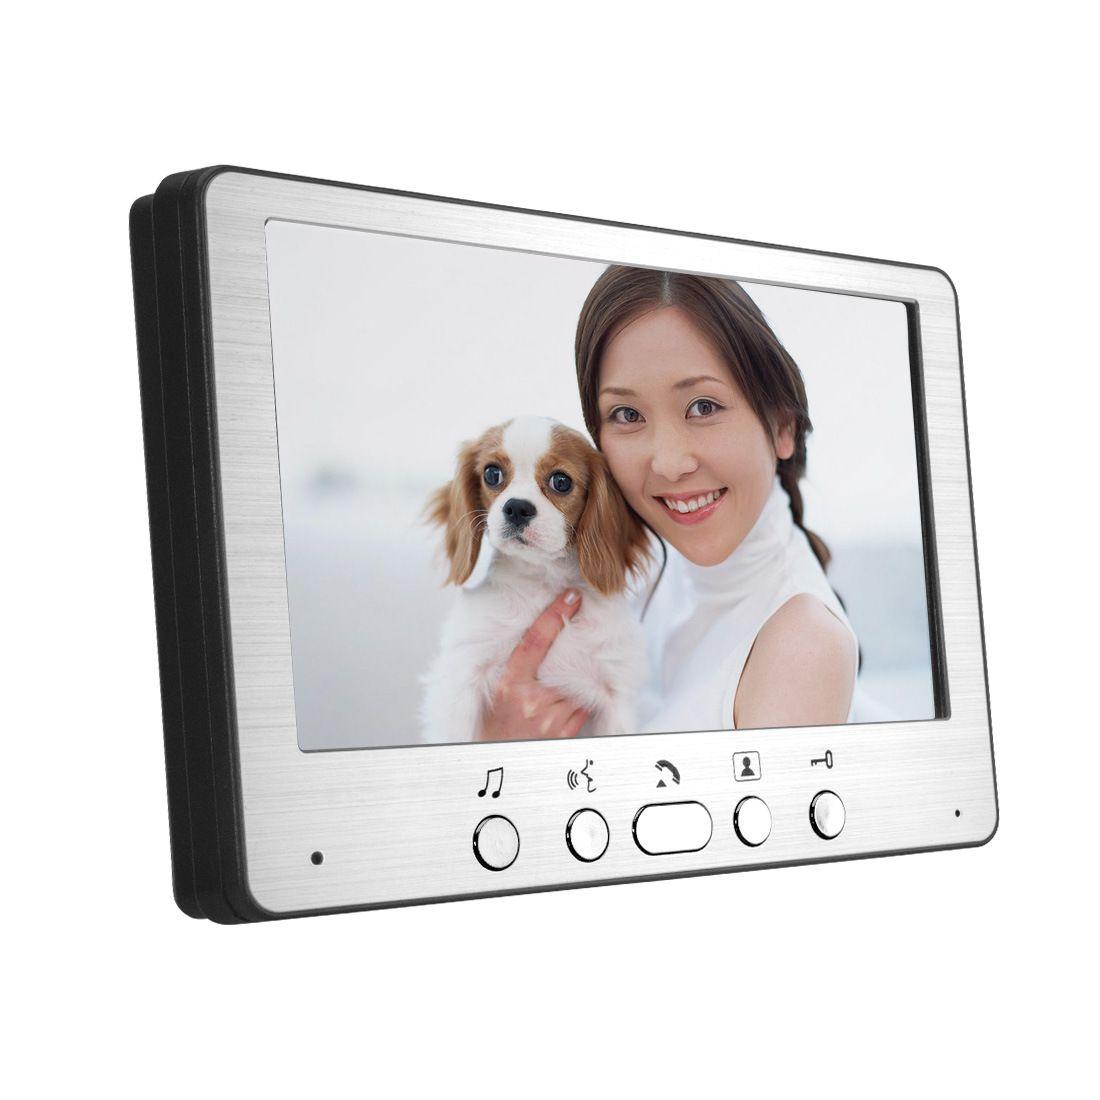 "HD 7 ""TFT cor Vídeo Porteiro Intercom Doorbell Home Security Camera Monitor sistema de Visão Noturna"